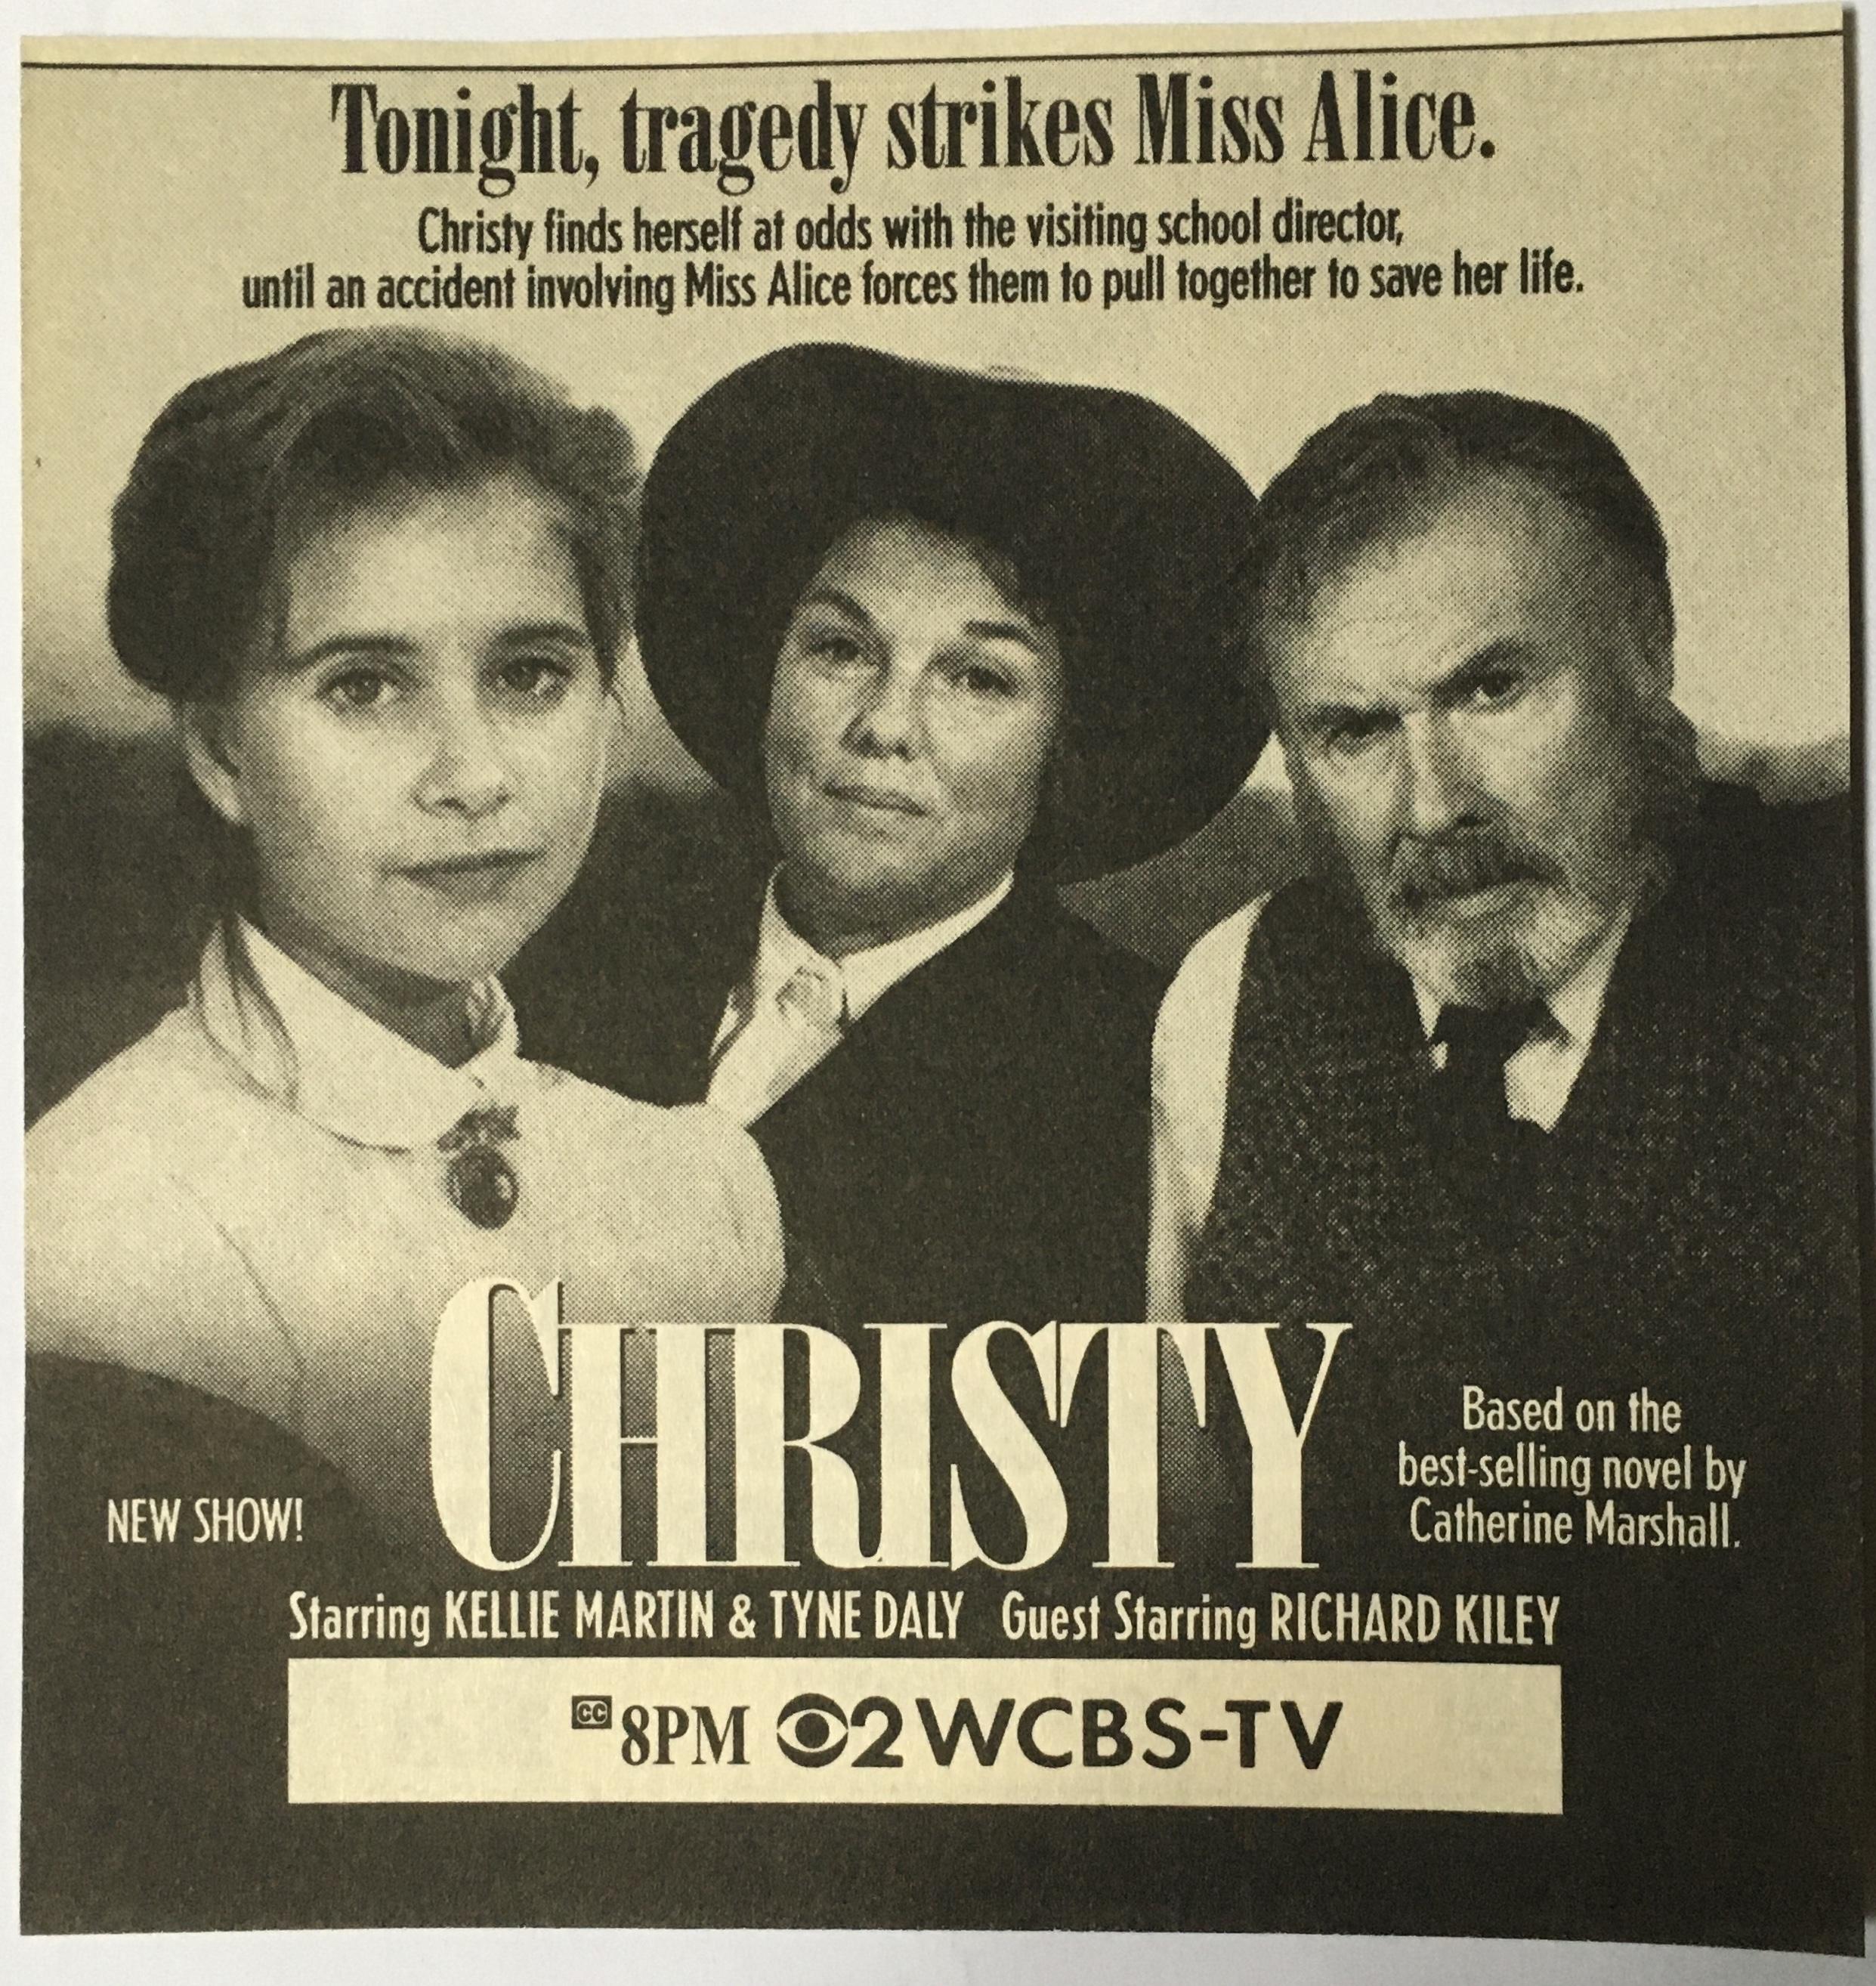 Download Filme Christy Martin Torrent 2021 Qualidade Hd